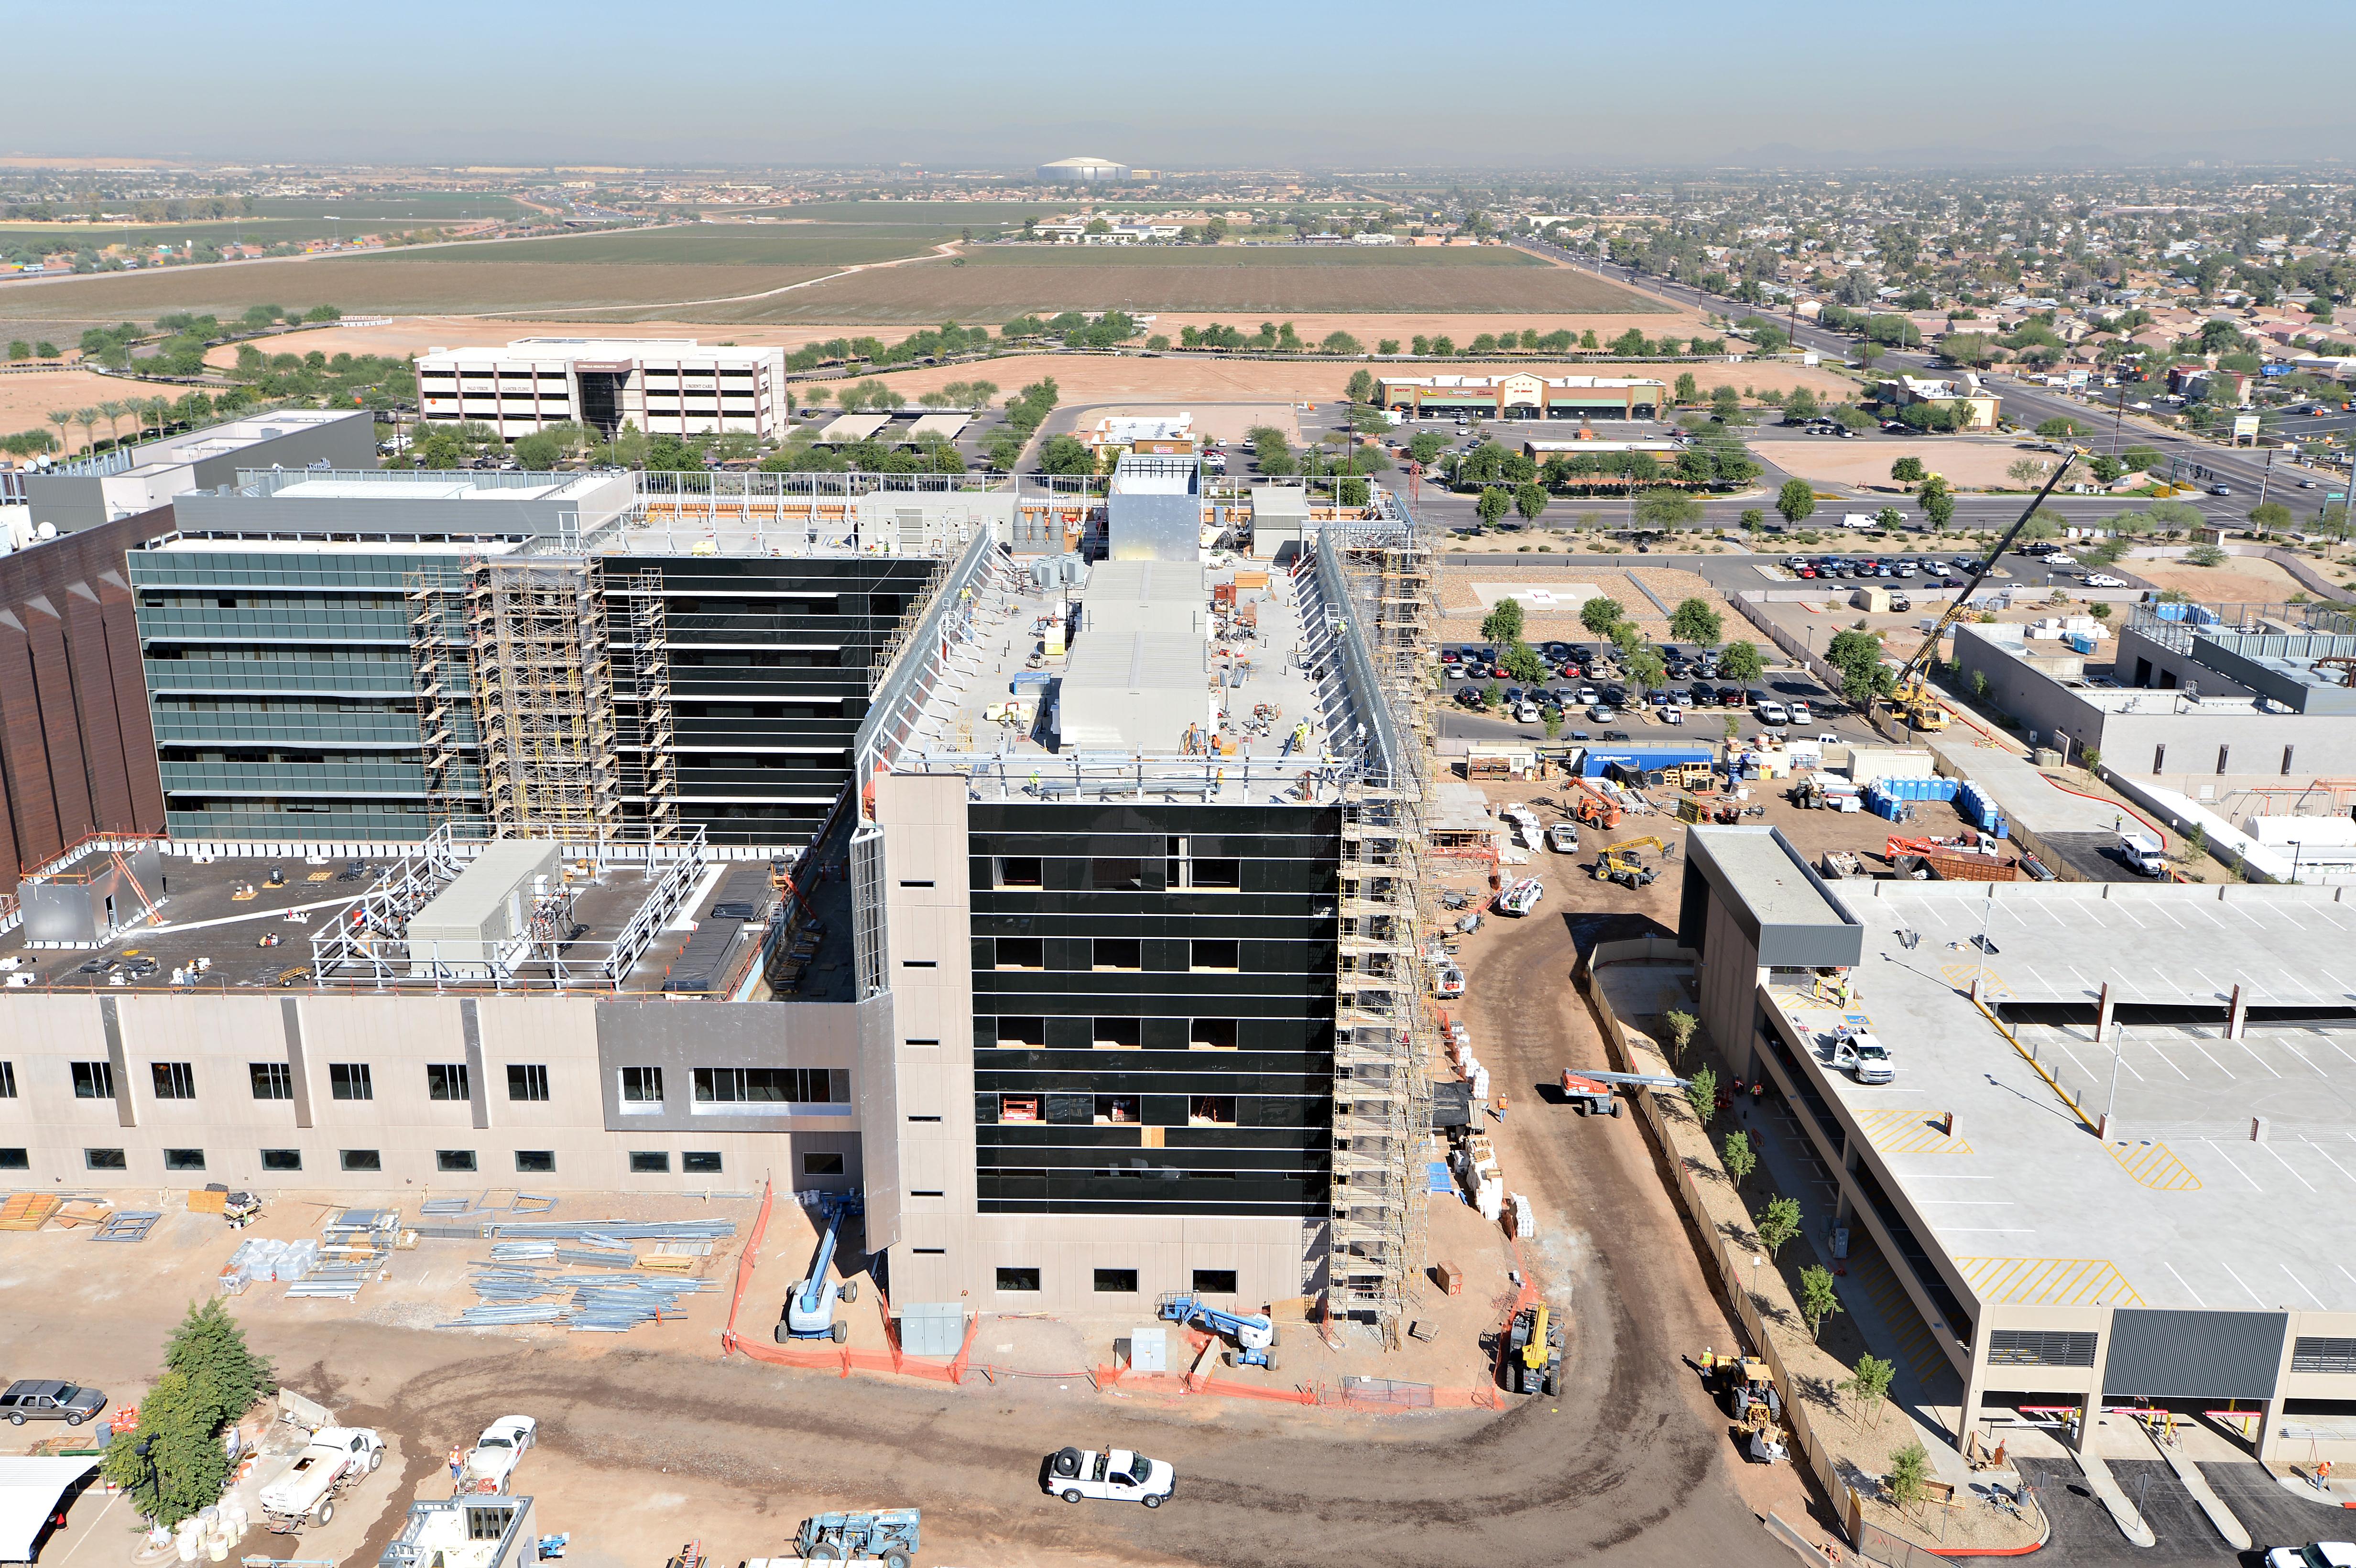 Banner Estrella Hospital 10-25-13 (9)